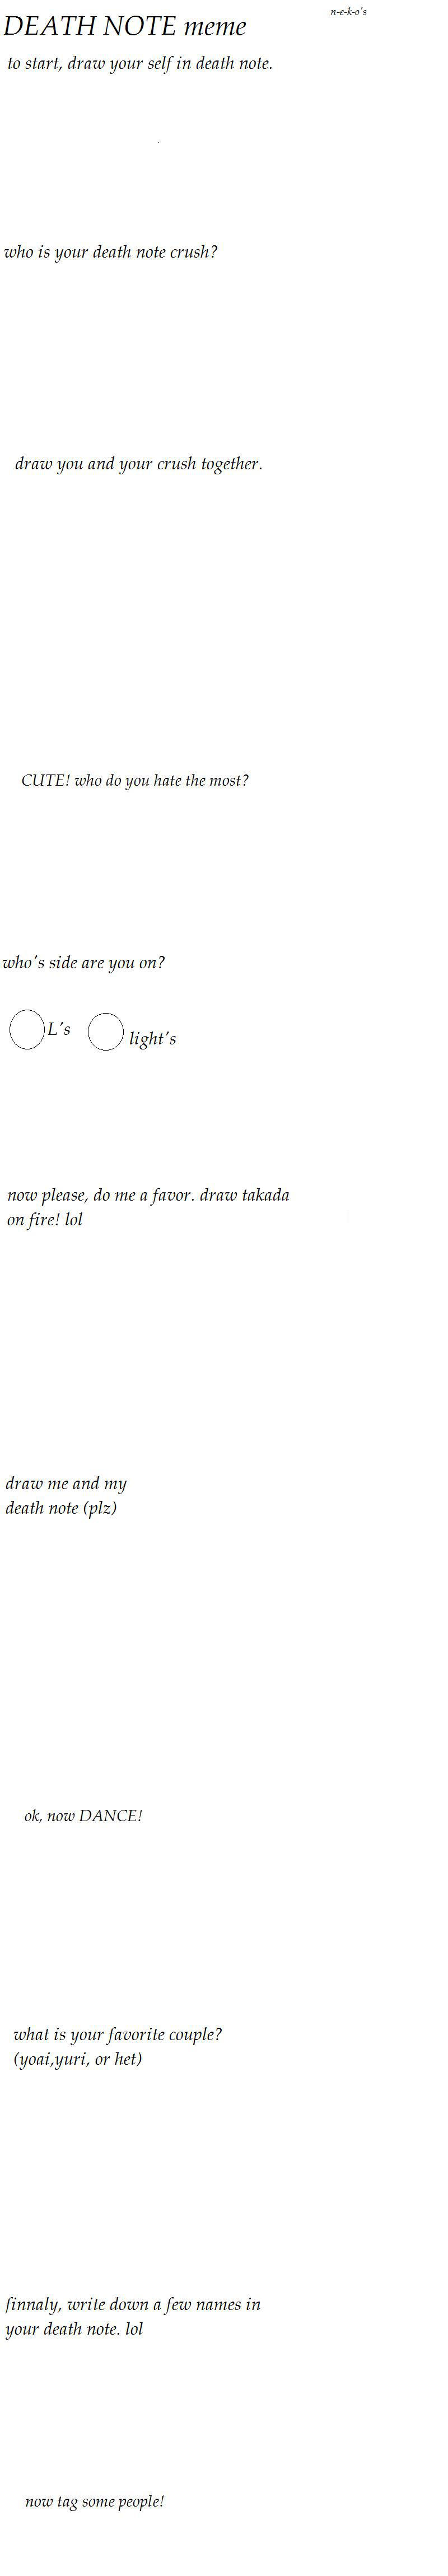 Death Note Meme Template By N E K O On Deviantart